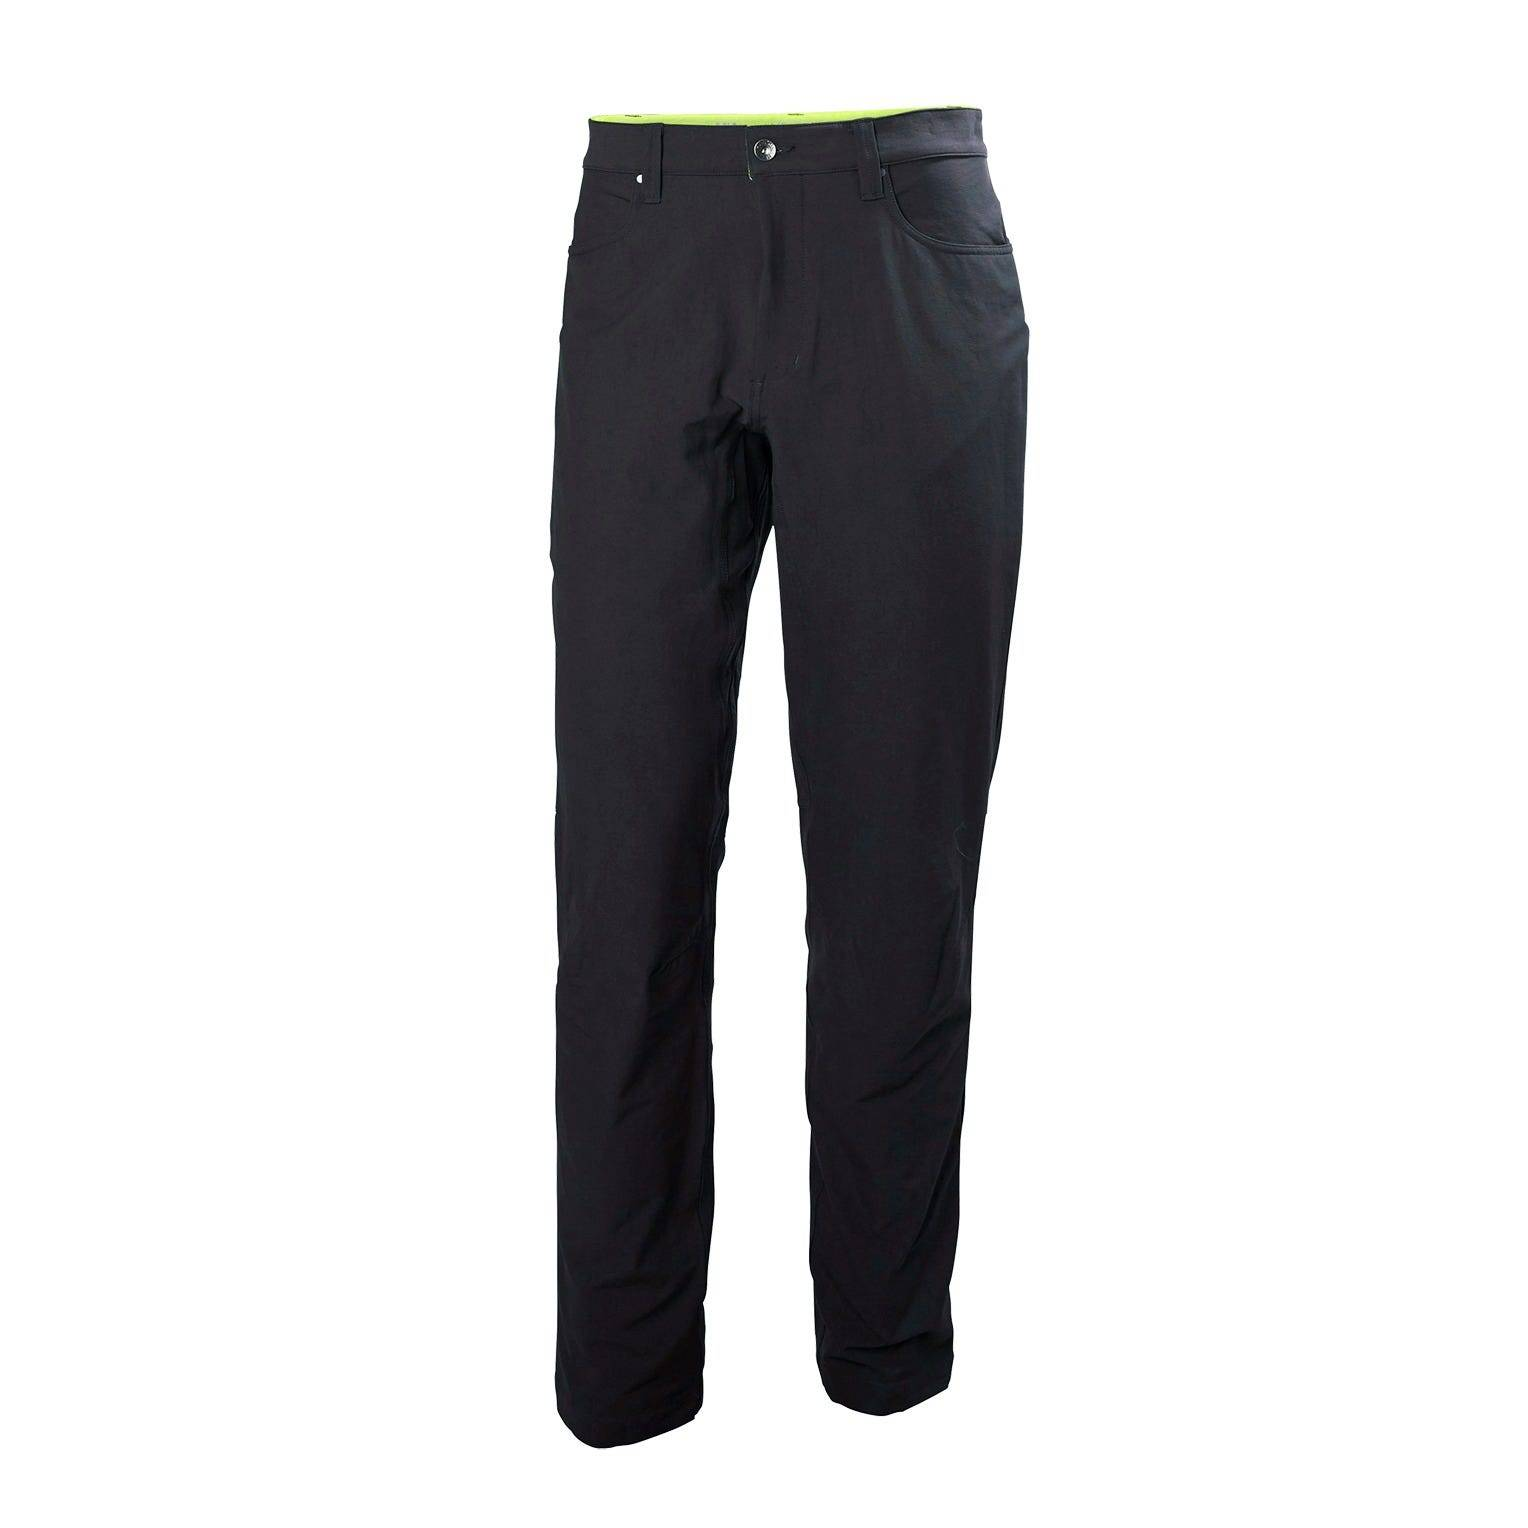 Helly Hansen Vanir 5 Pocket Pant Mens Hiking Navy XXL